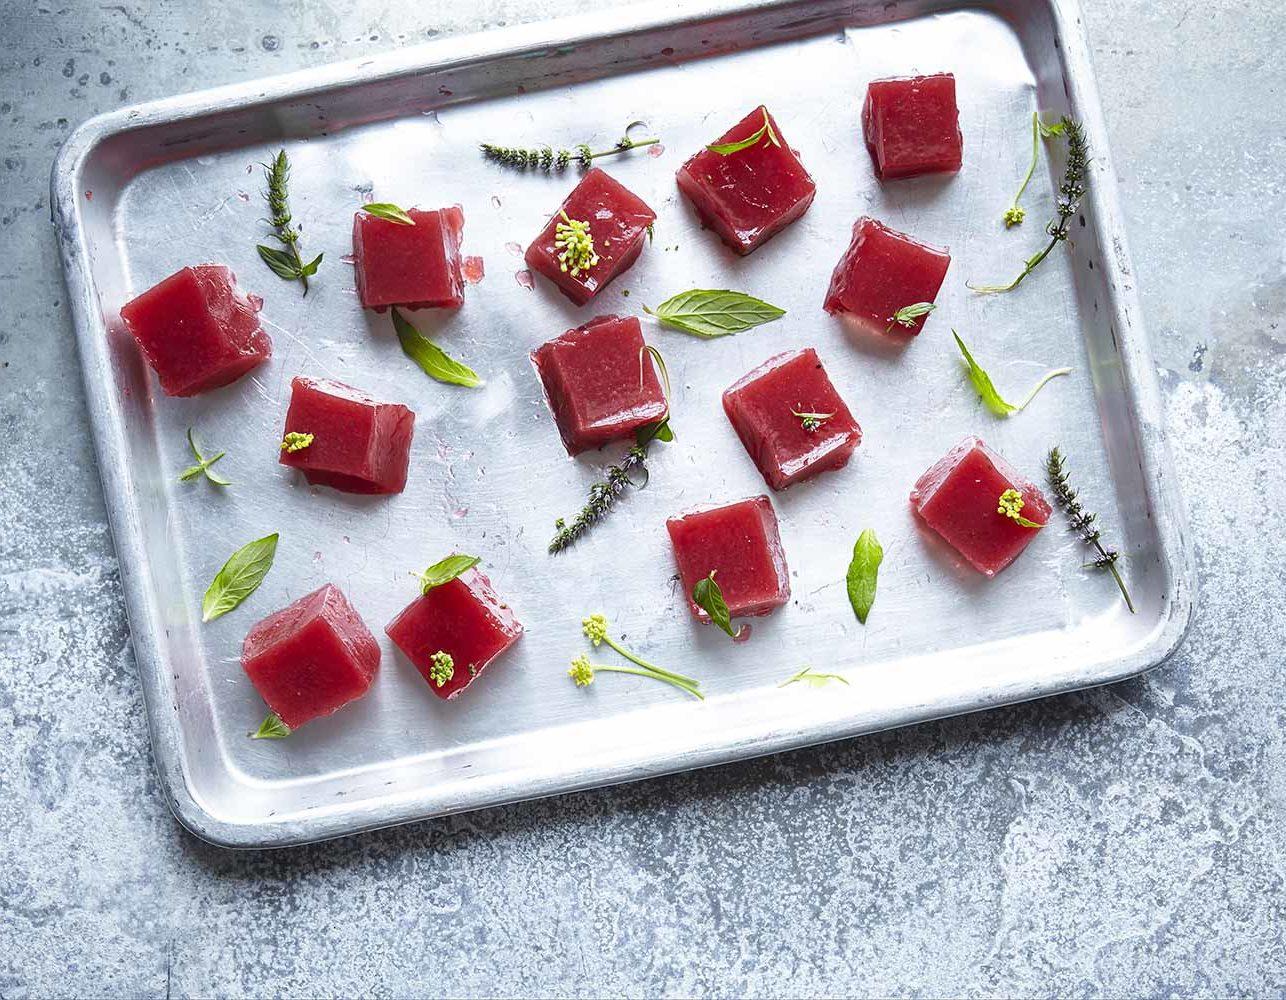 Kombucha, liquorice, raspberry and mint gut jellies 17 herbs to help your health